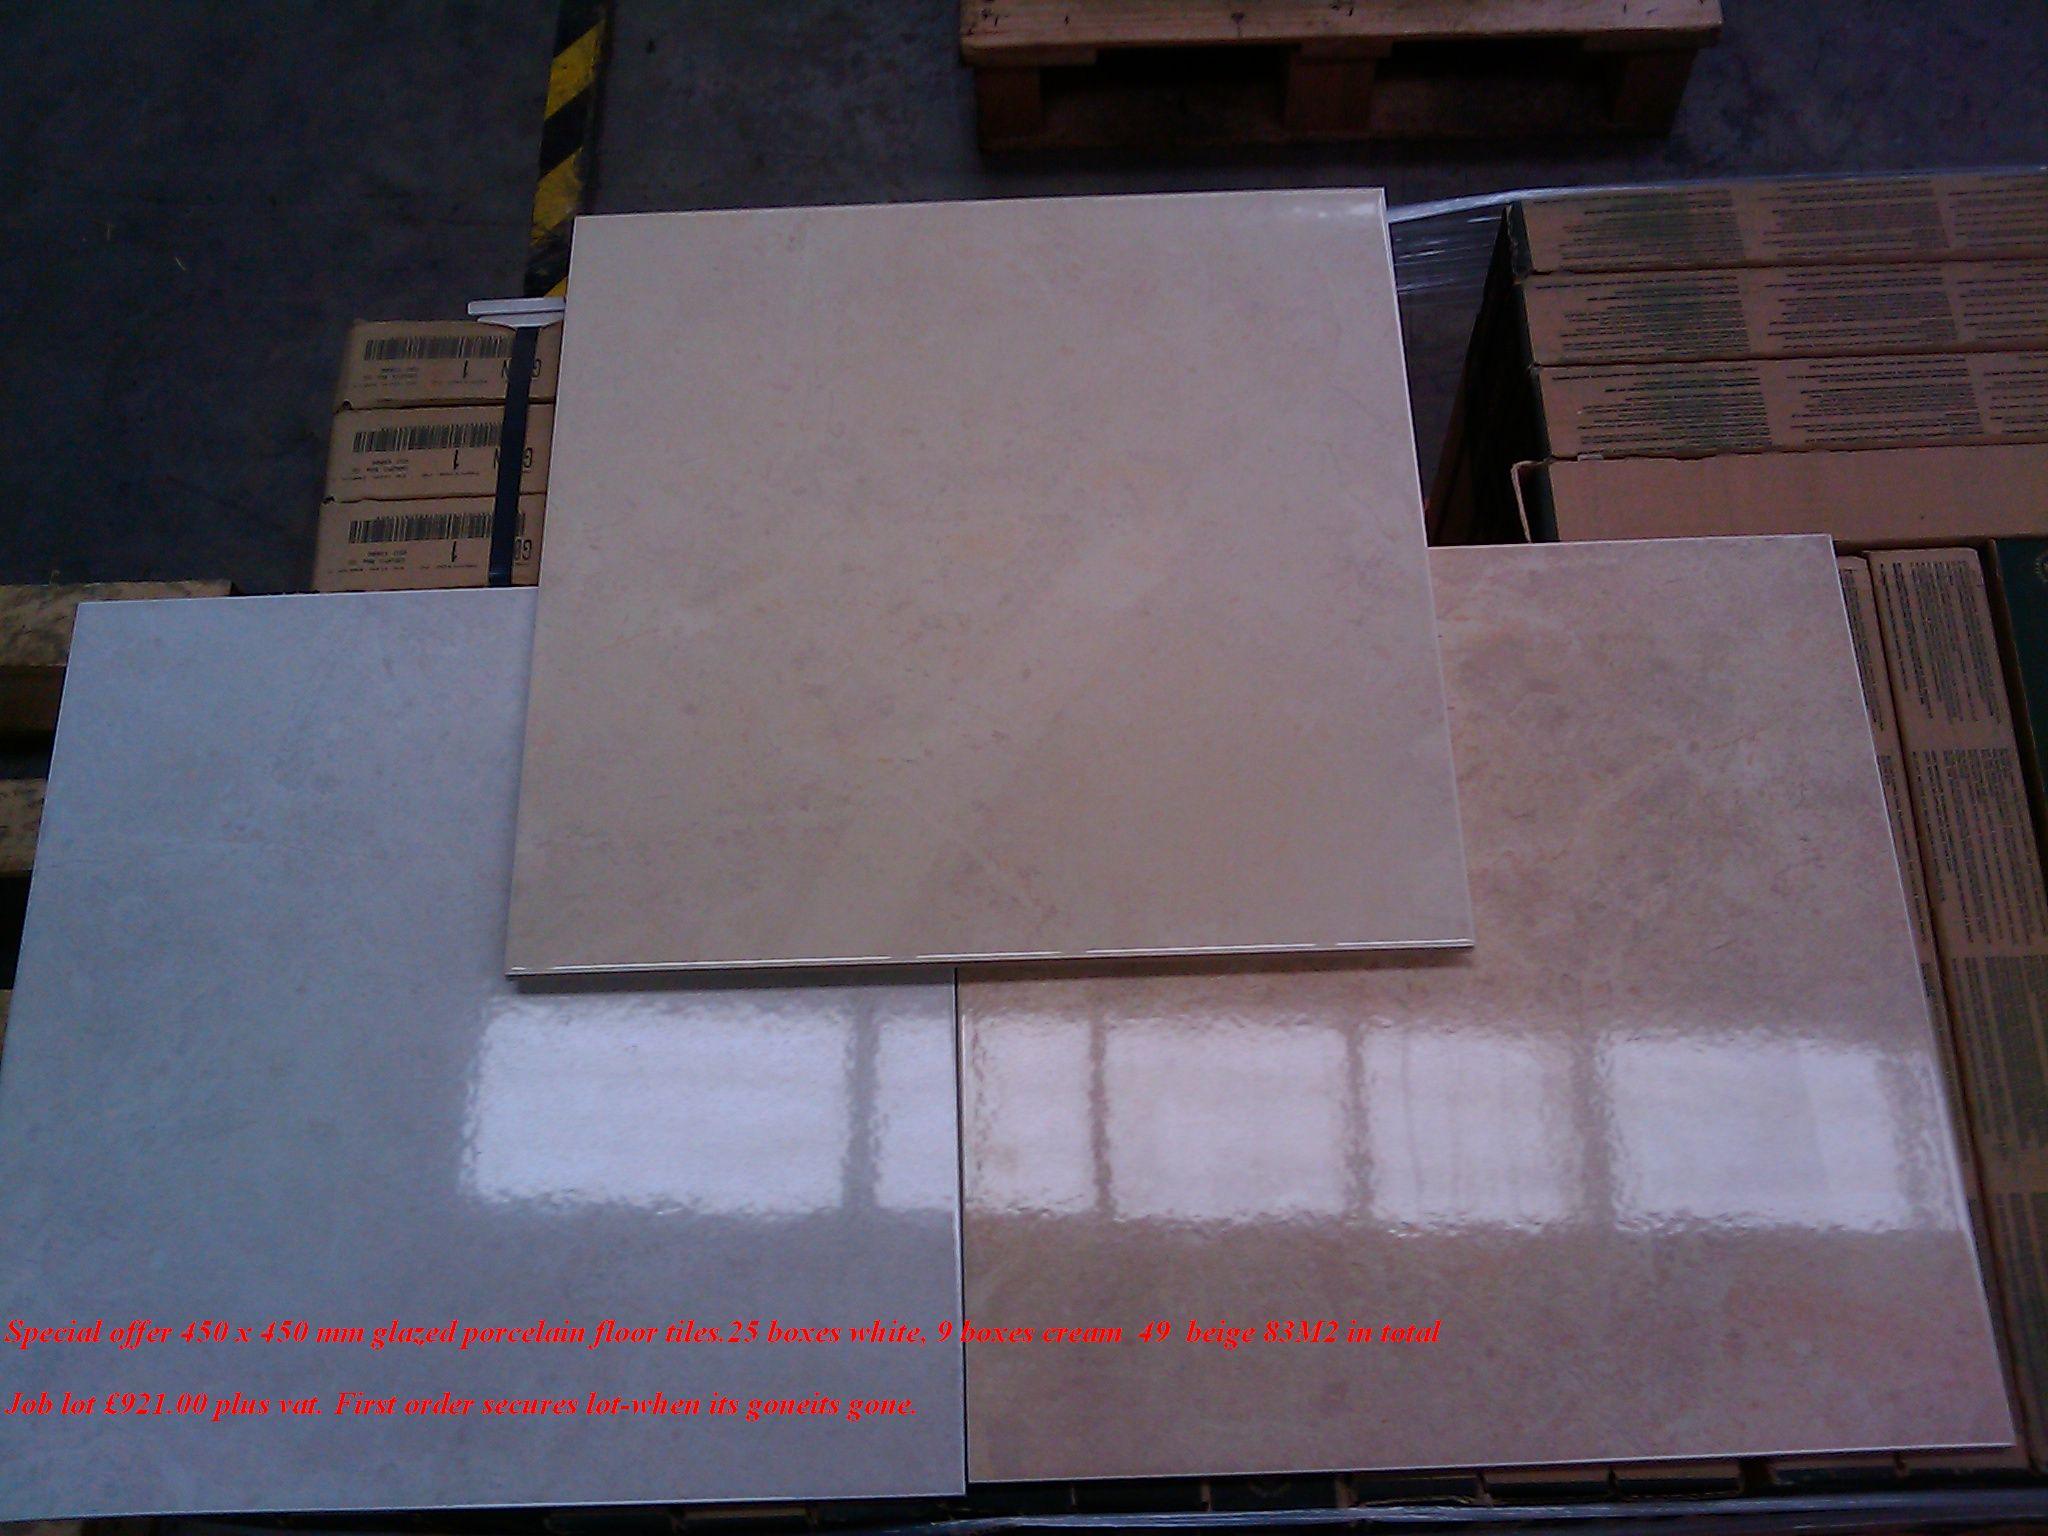 Great 12 Inch Ceramic Tile Big 4 X 8 Glass Subway Tile Clean 4X4 Floor Tile 6 Inch Tile Backsplash Young 6 X 12 Ceramic Tile Red6 X 6 Ceramic Wall Tile Tile King | Be Inspired :: Floor Tiles